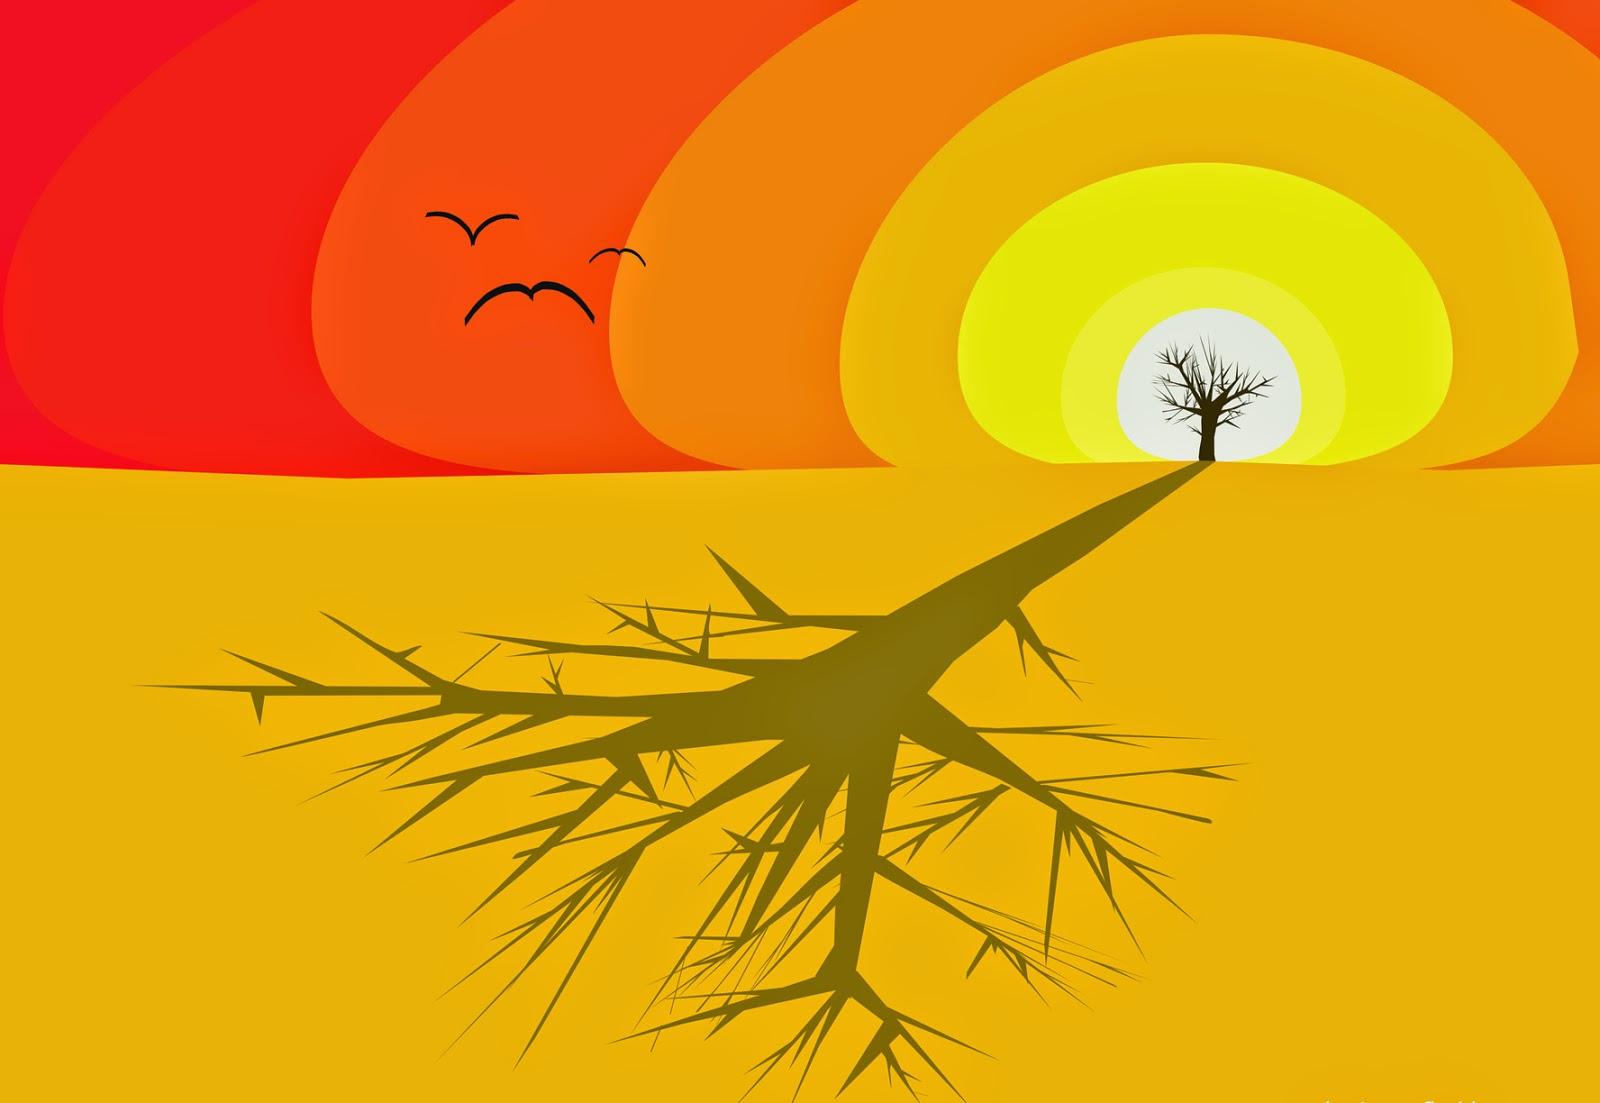 Sunset in the desert, Atardecer en el desierto, Posta de sol al desert, Sonnenuntergang in der Wüste, Coucher de soleil dans le désert,夕阳在沙漠中